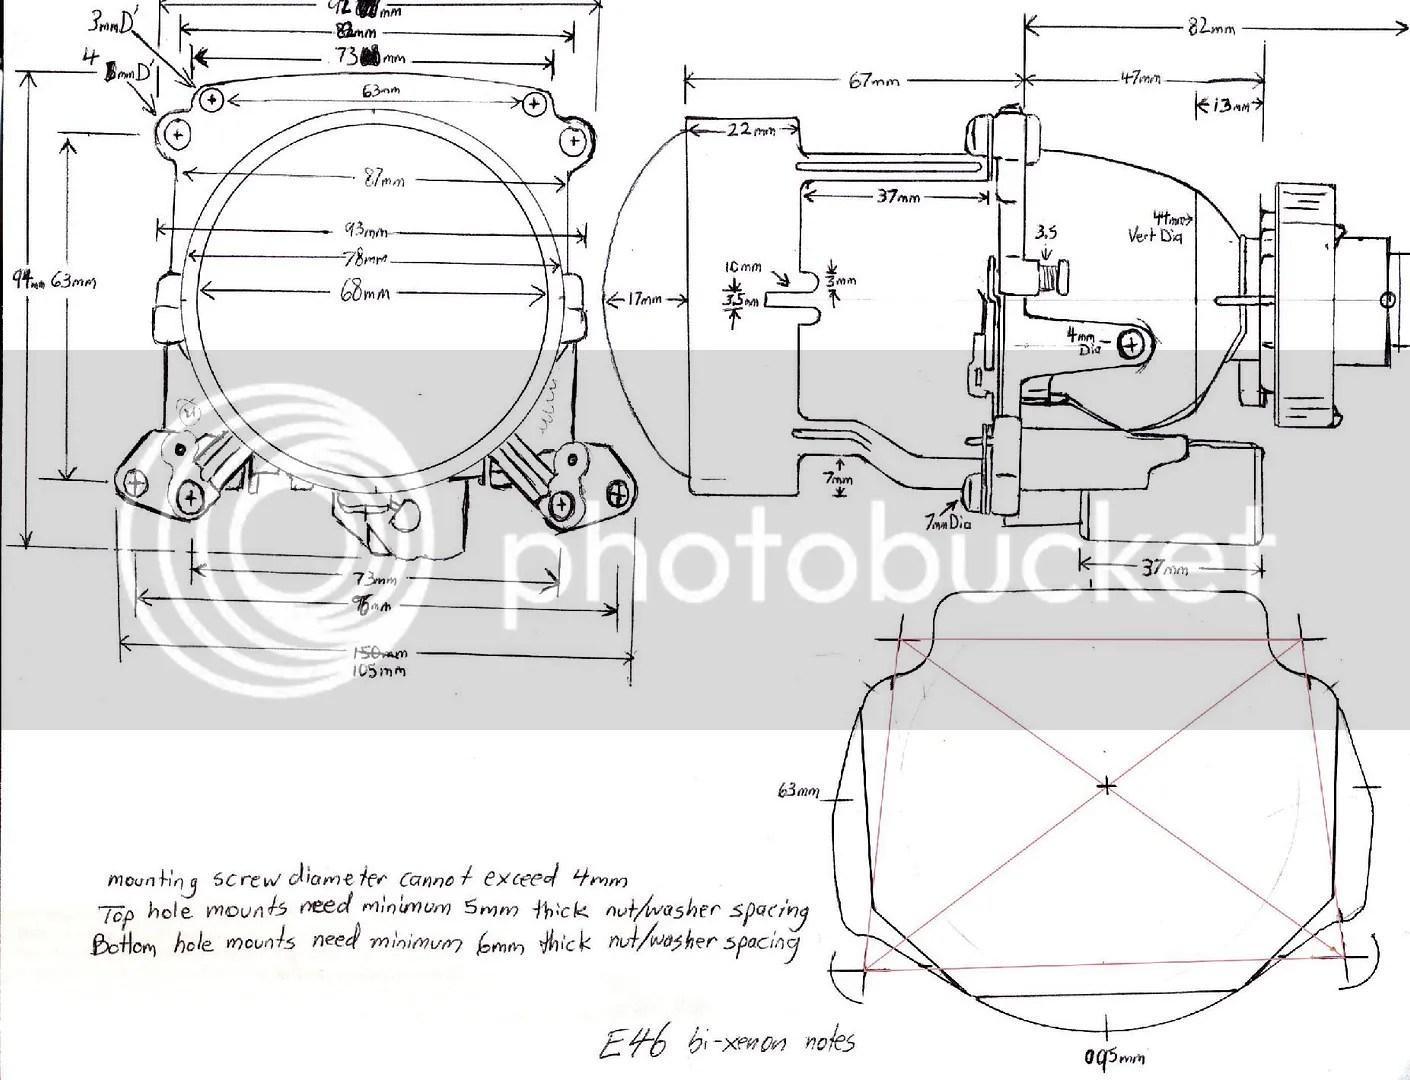 Projector Dimensions